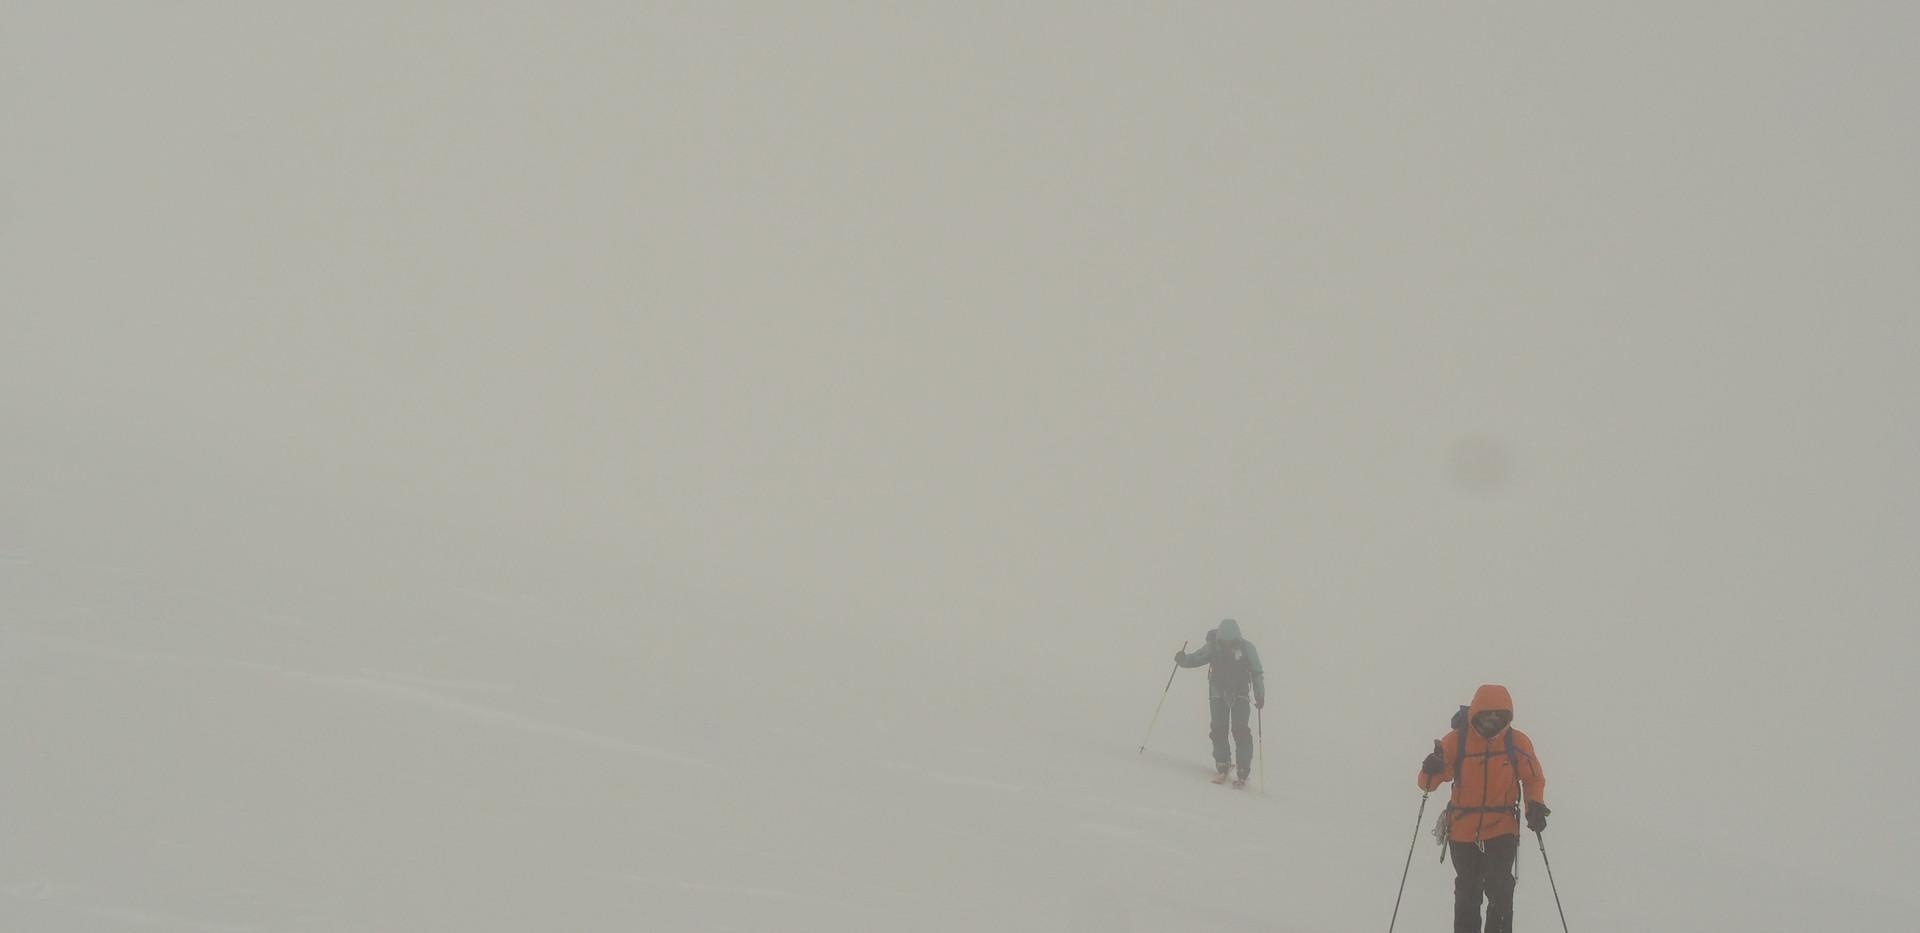 Summit day in the fog